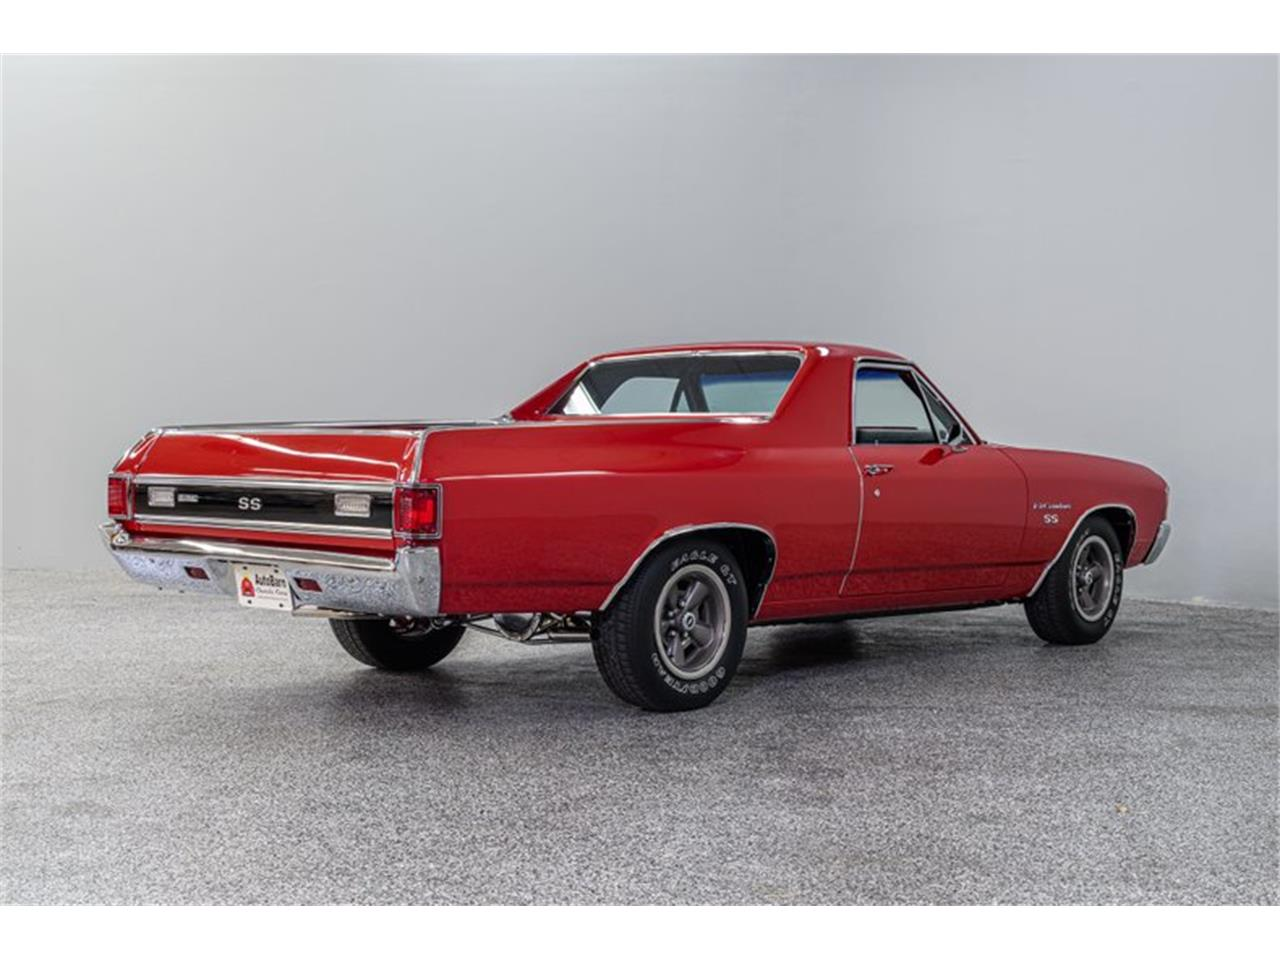 1972 Chevrolet El Camino (CC-1302990) for sale in Concord, North Carolina